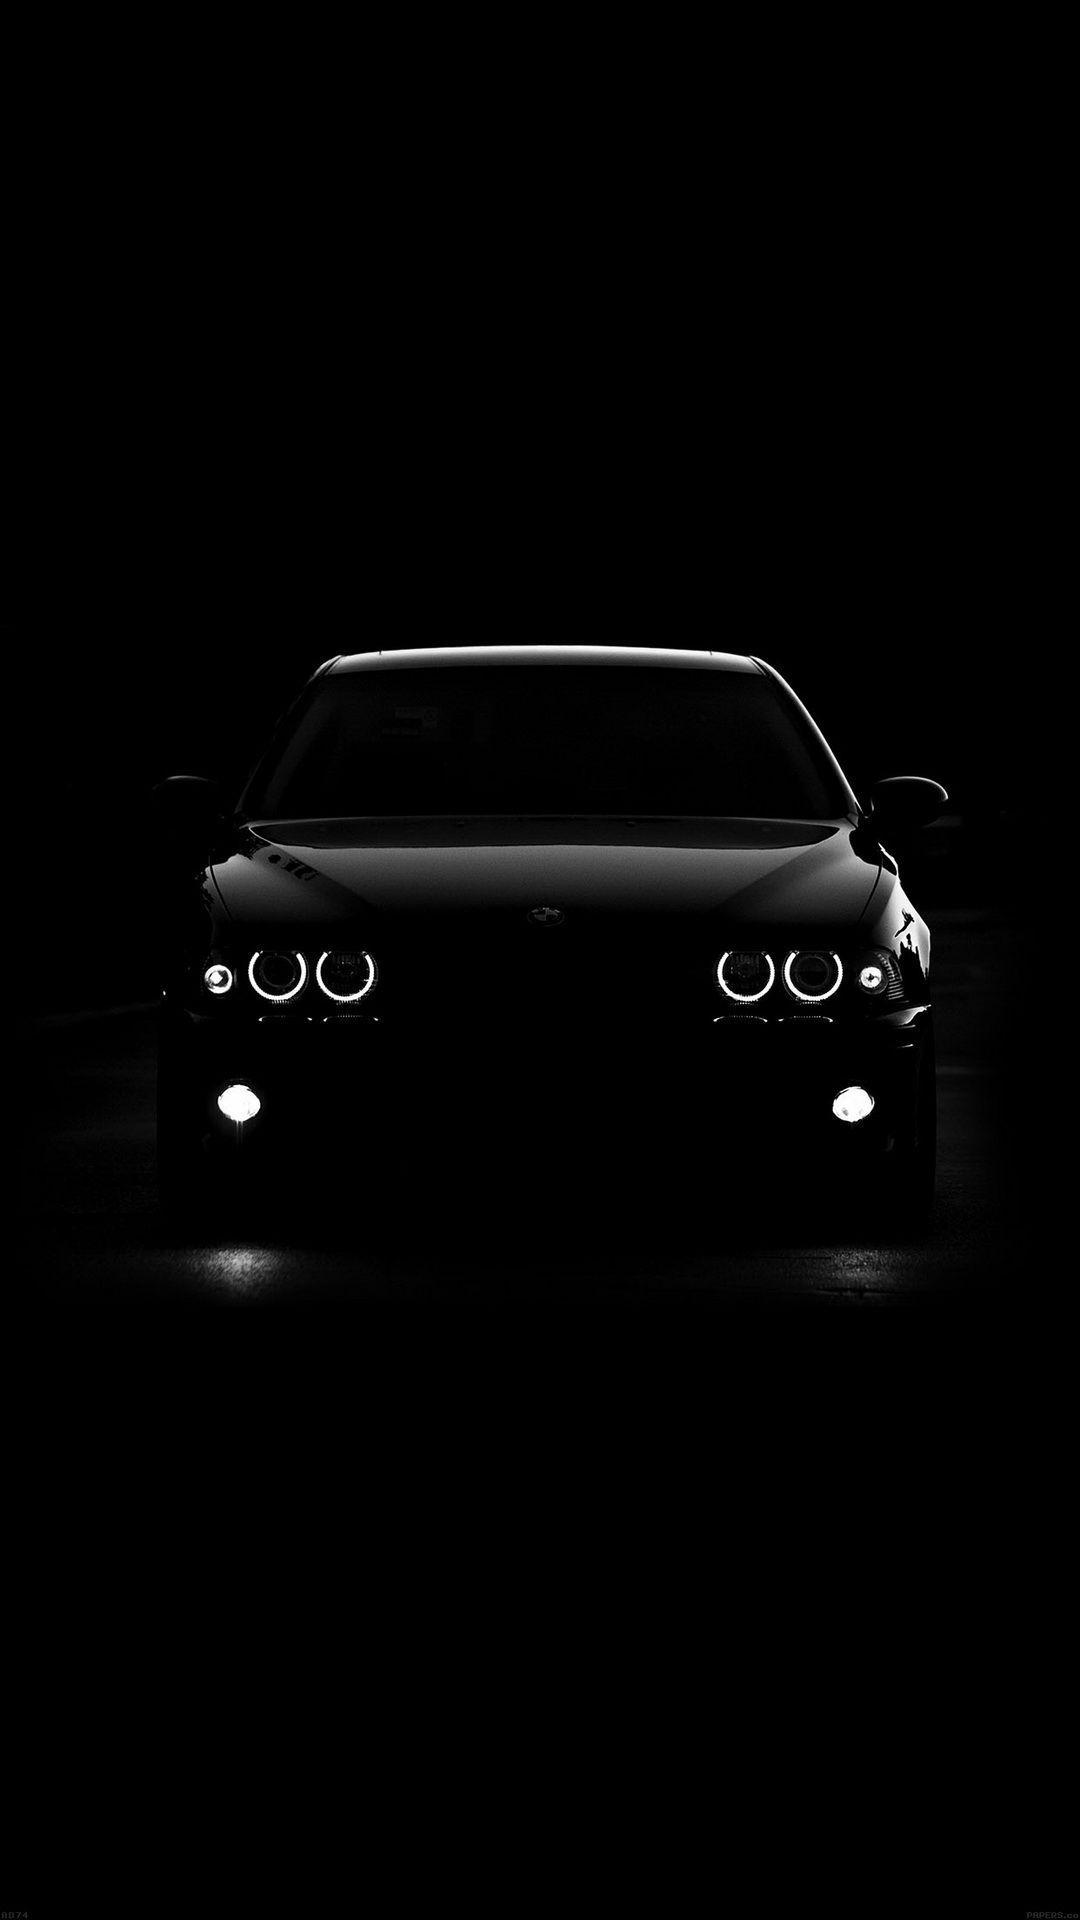 Black Car HD Wallpapers - Top Free Black Car HD ...